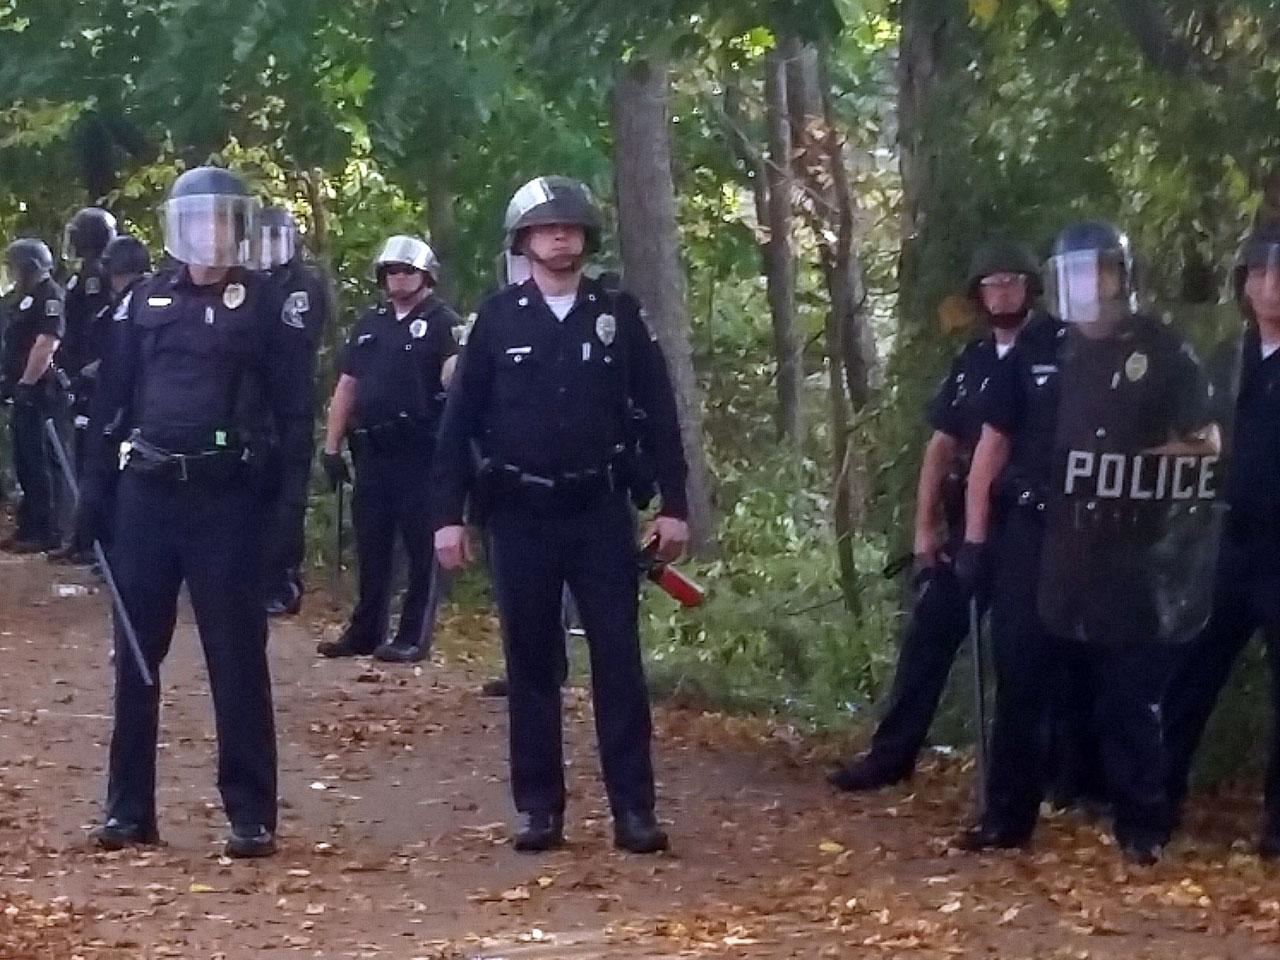 Keene, New Hampshire, pumpkin festival turns to mayhem - CBS